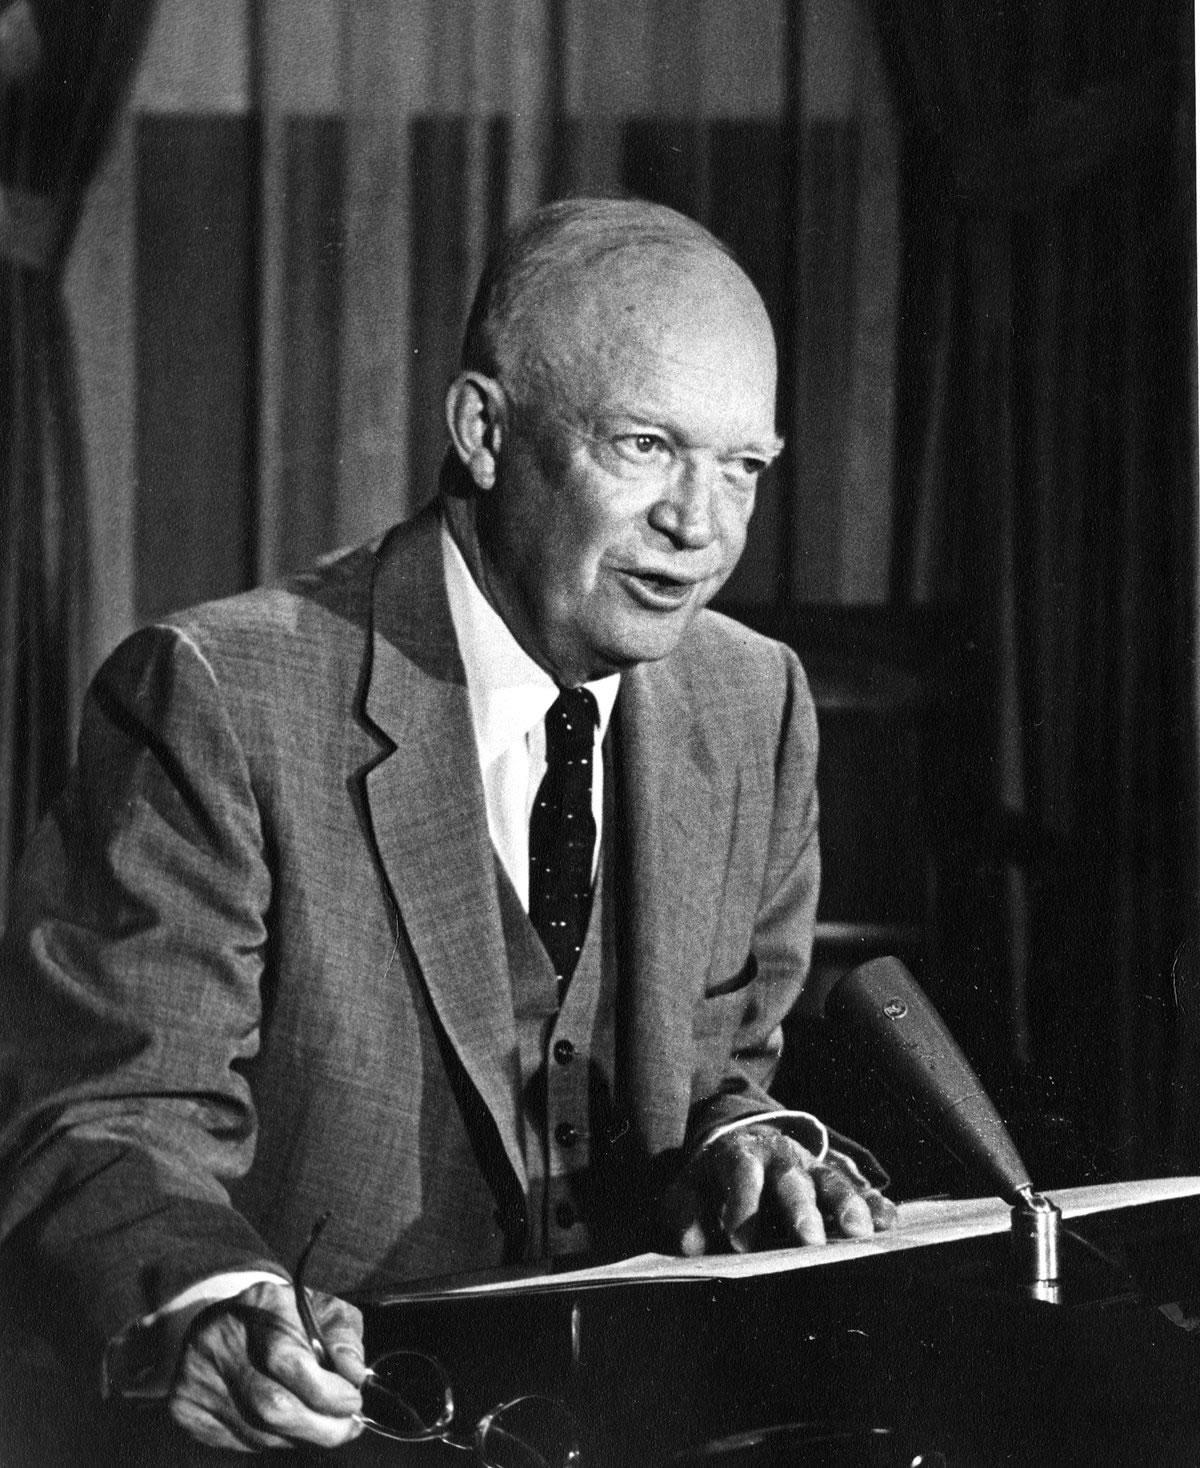 Dwight d eisenhower atoms for peace 8 december 1953 voices eisenhower publicscrutiny Image collections